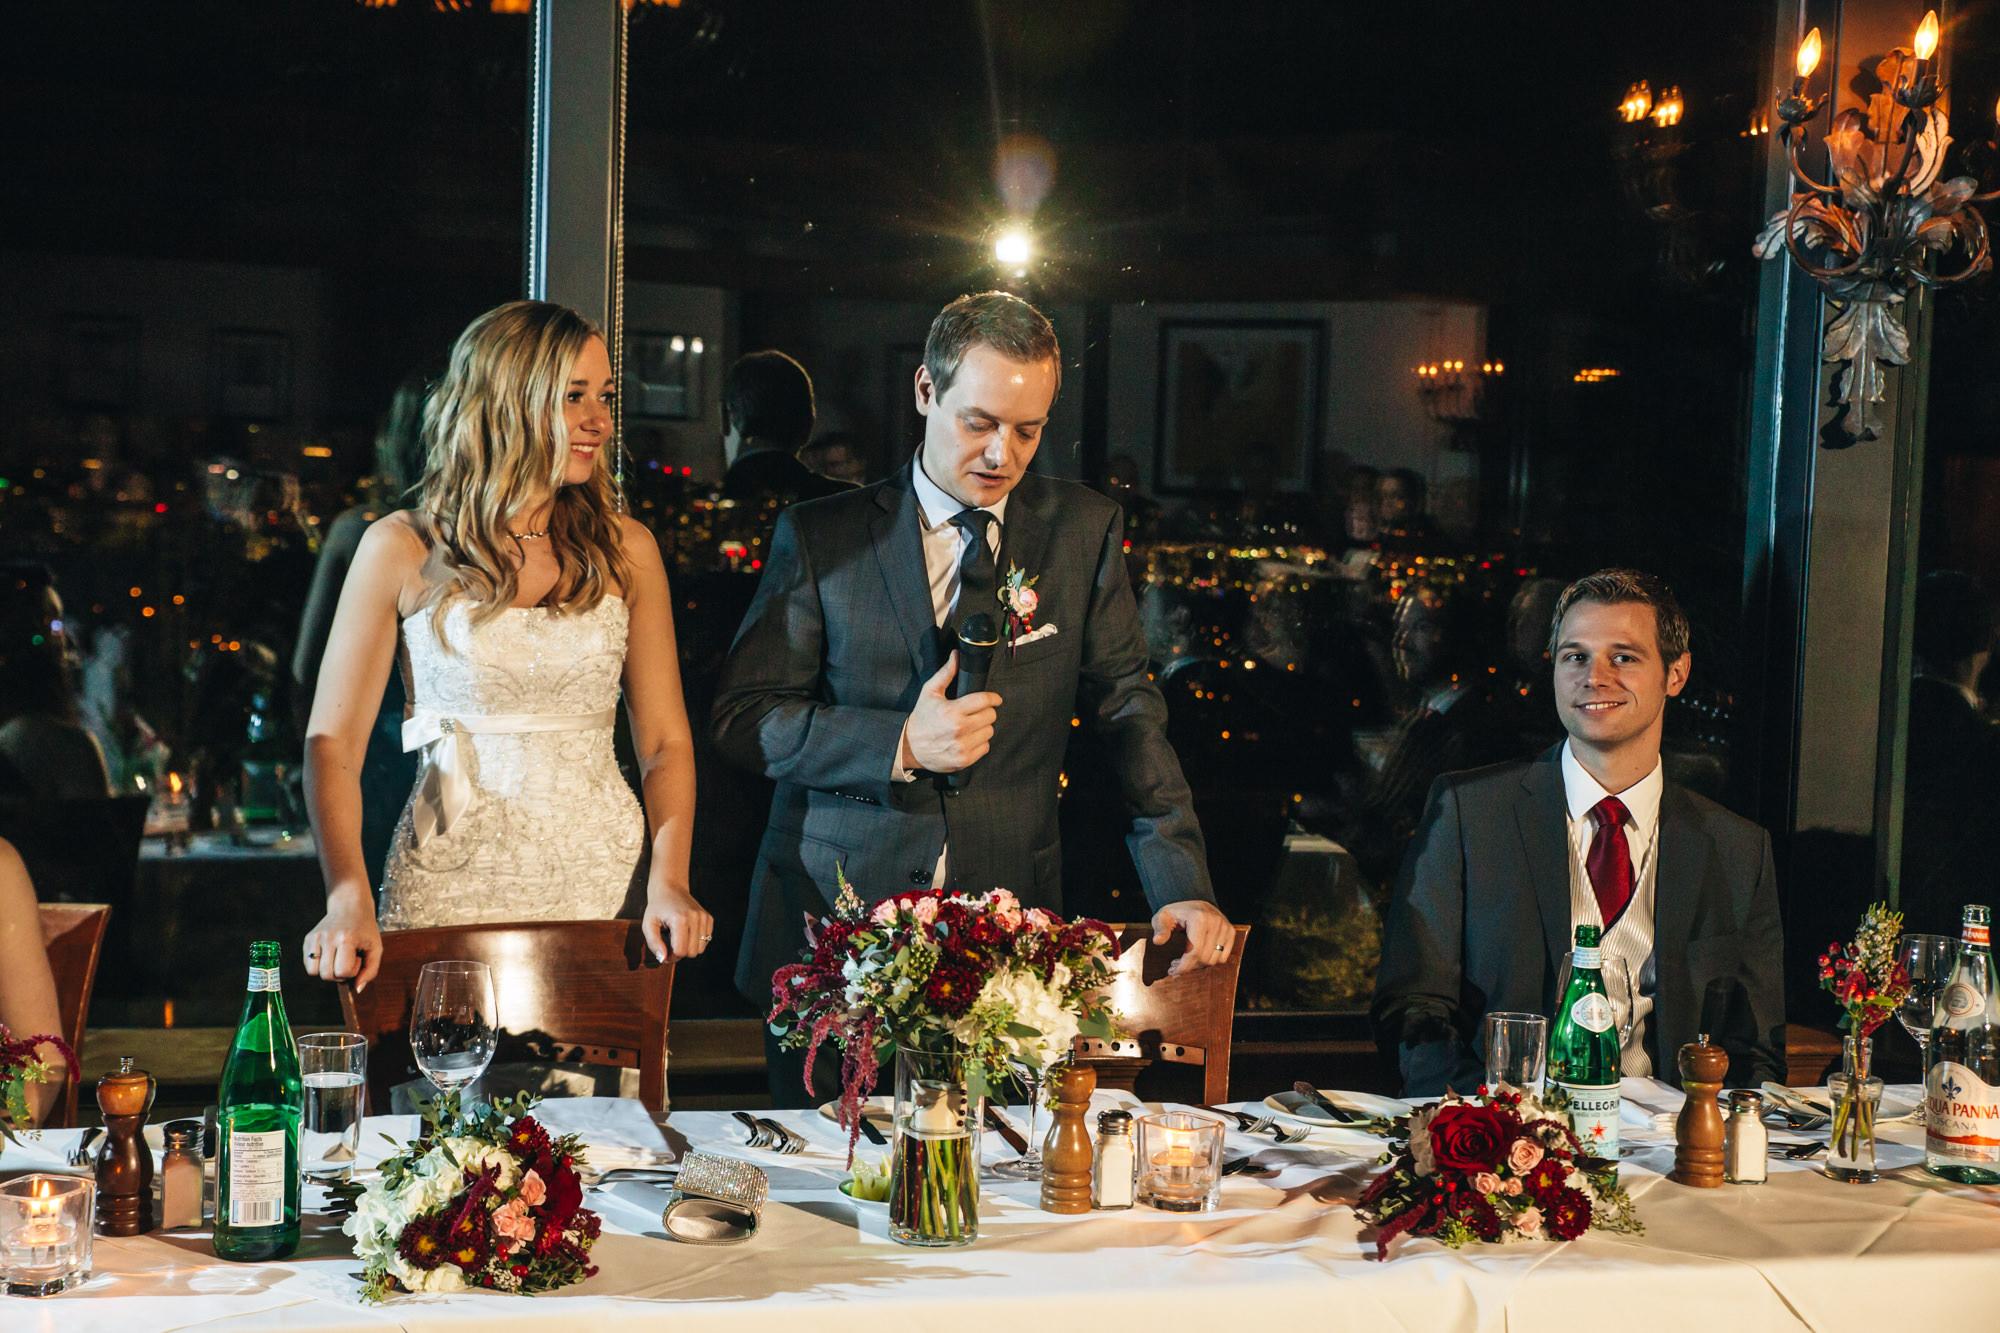 56-seasons-in-the-park-wedding-reception.jpg